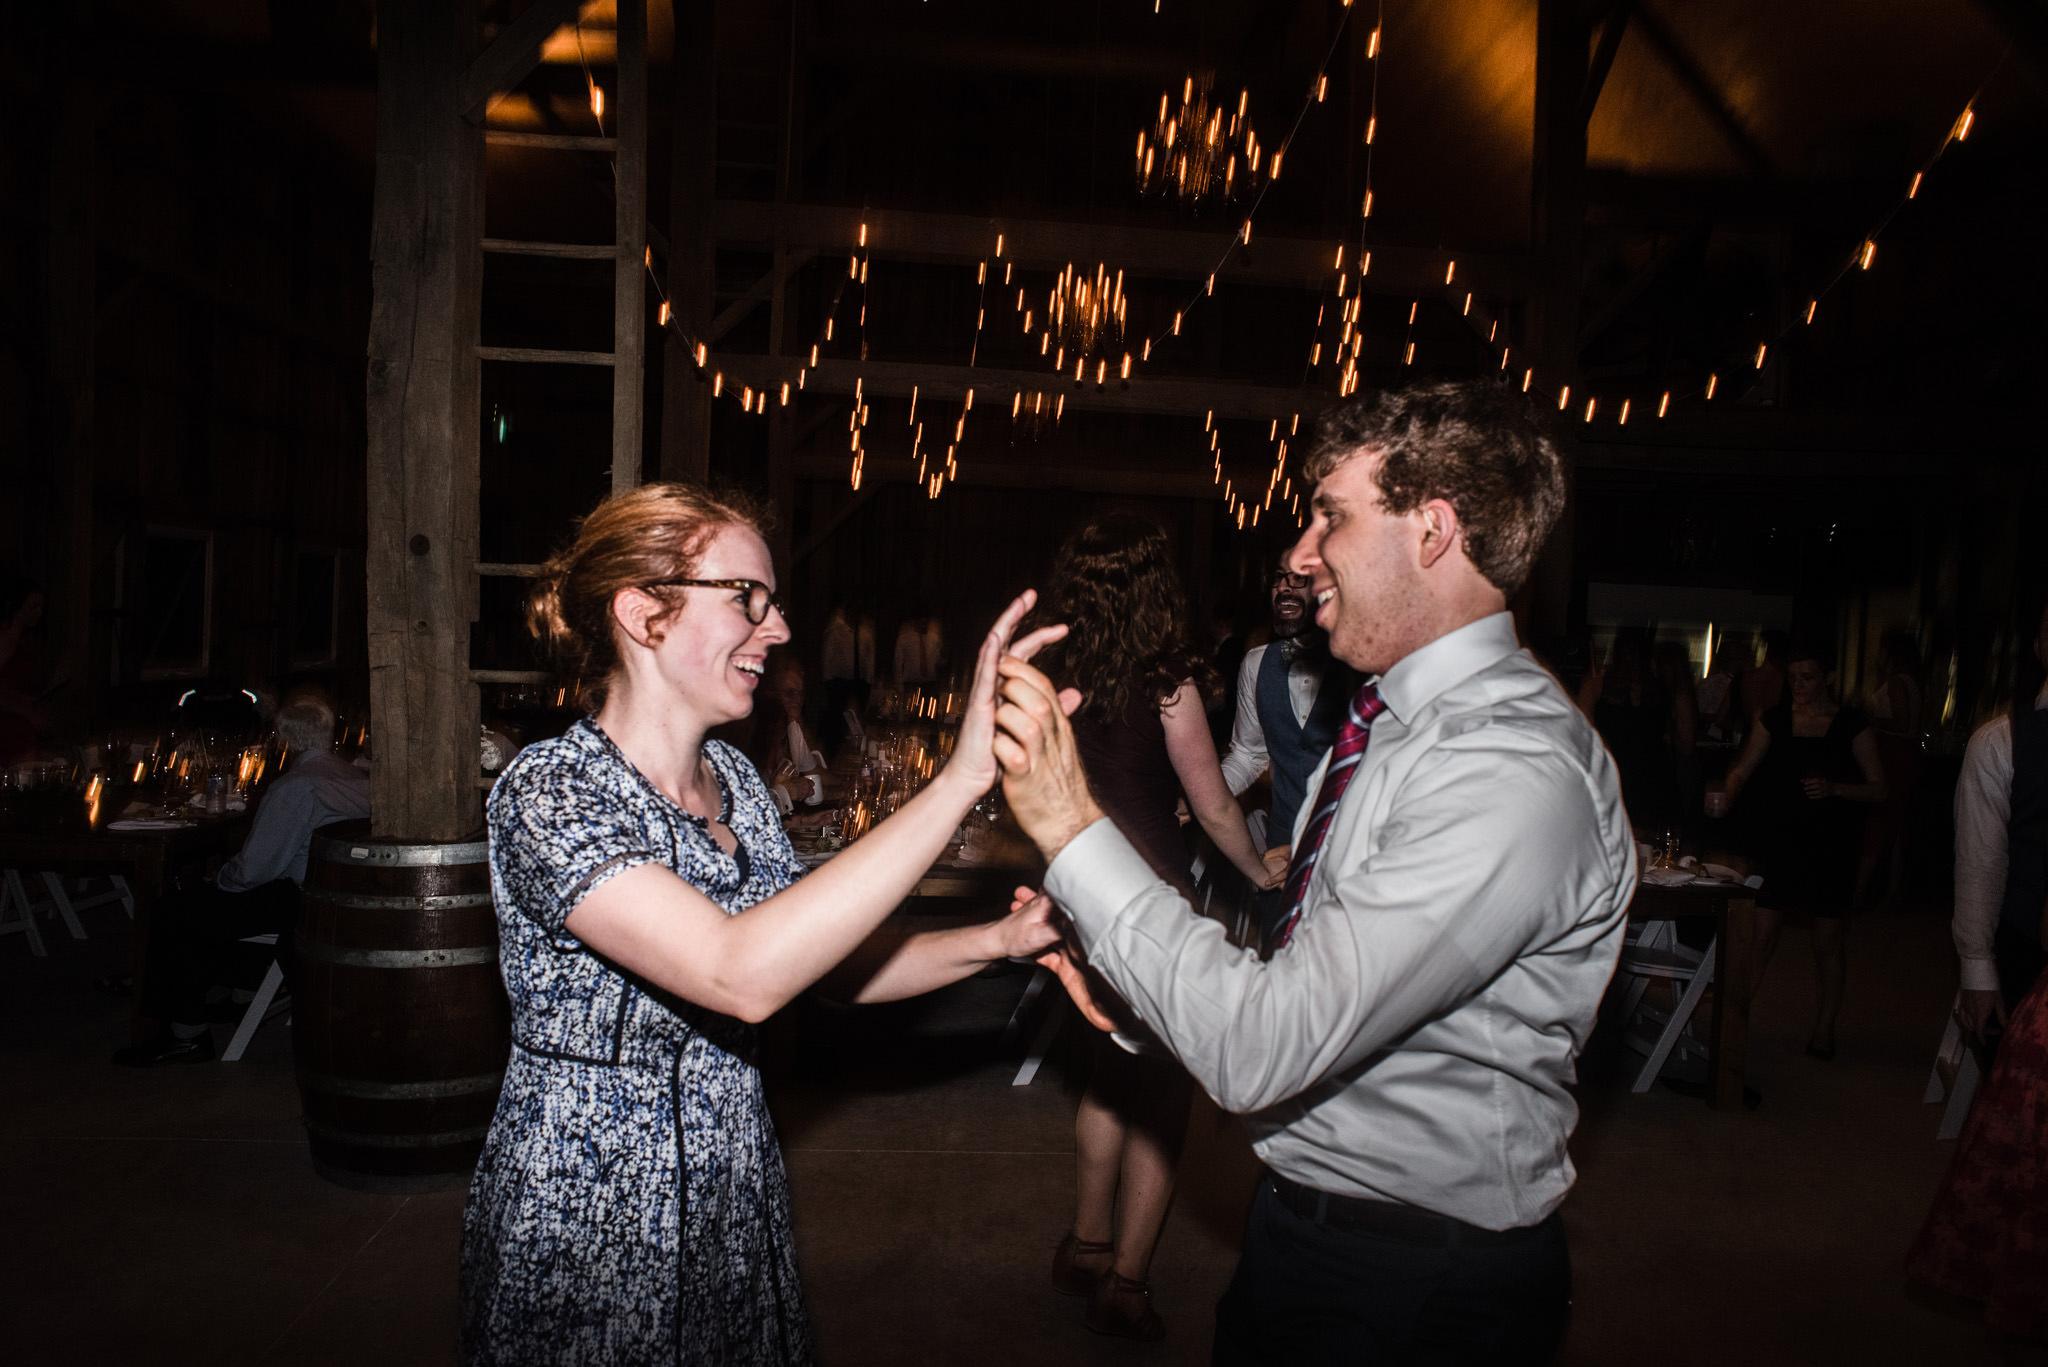 080-sydenham-ridge-wedding-reception.jpg